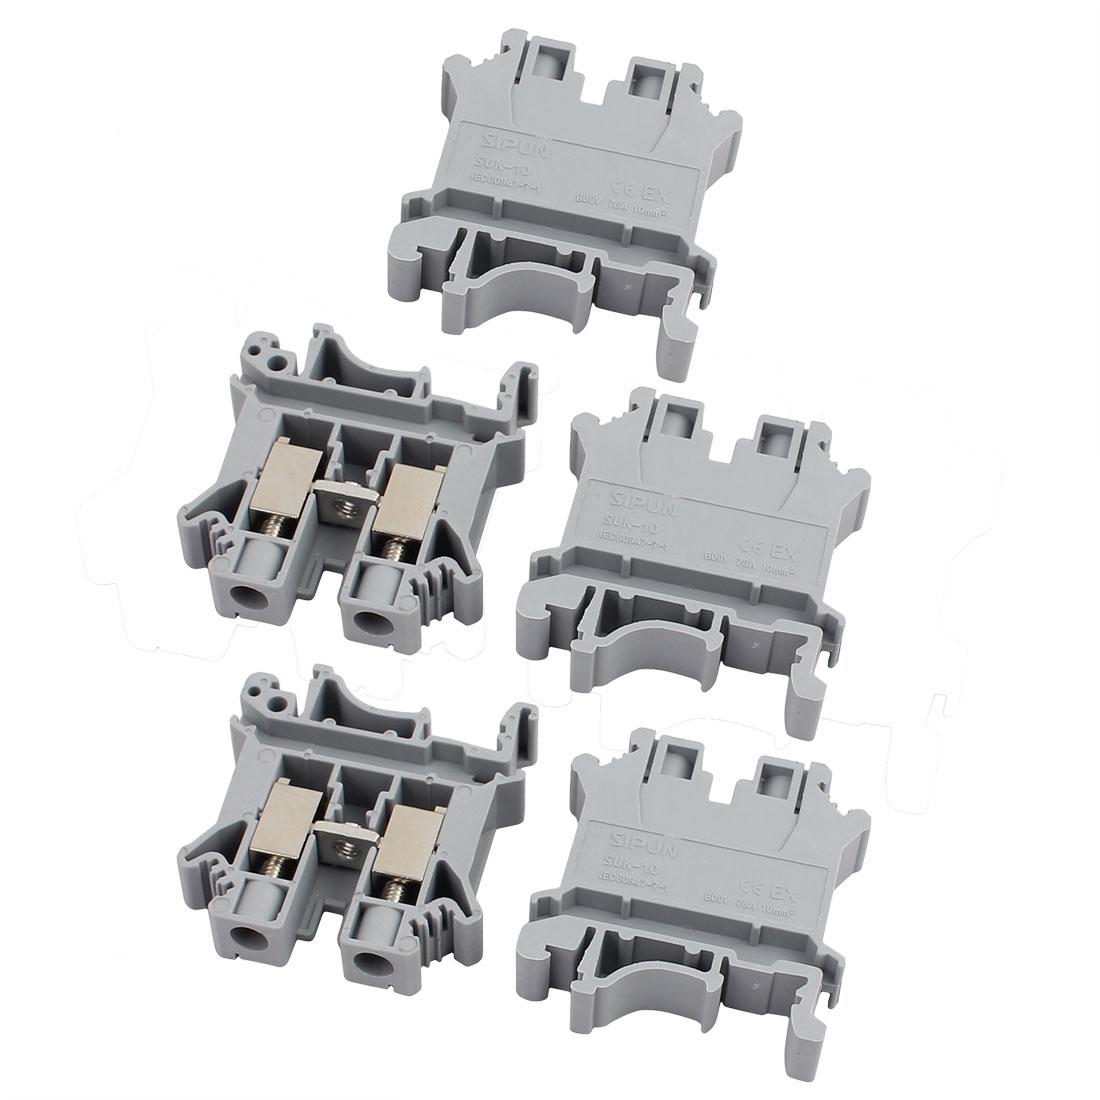 SUK-10N 800V 76A Rail Mount 10mm2 Cable Screwless Terminal Block Gray 5pcs